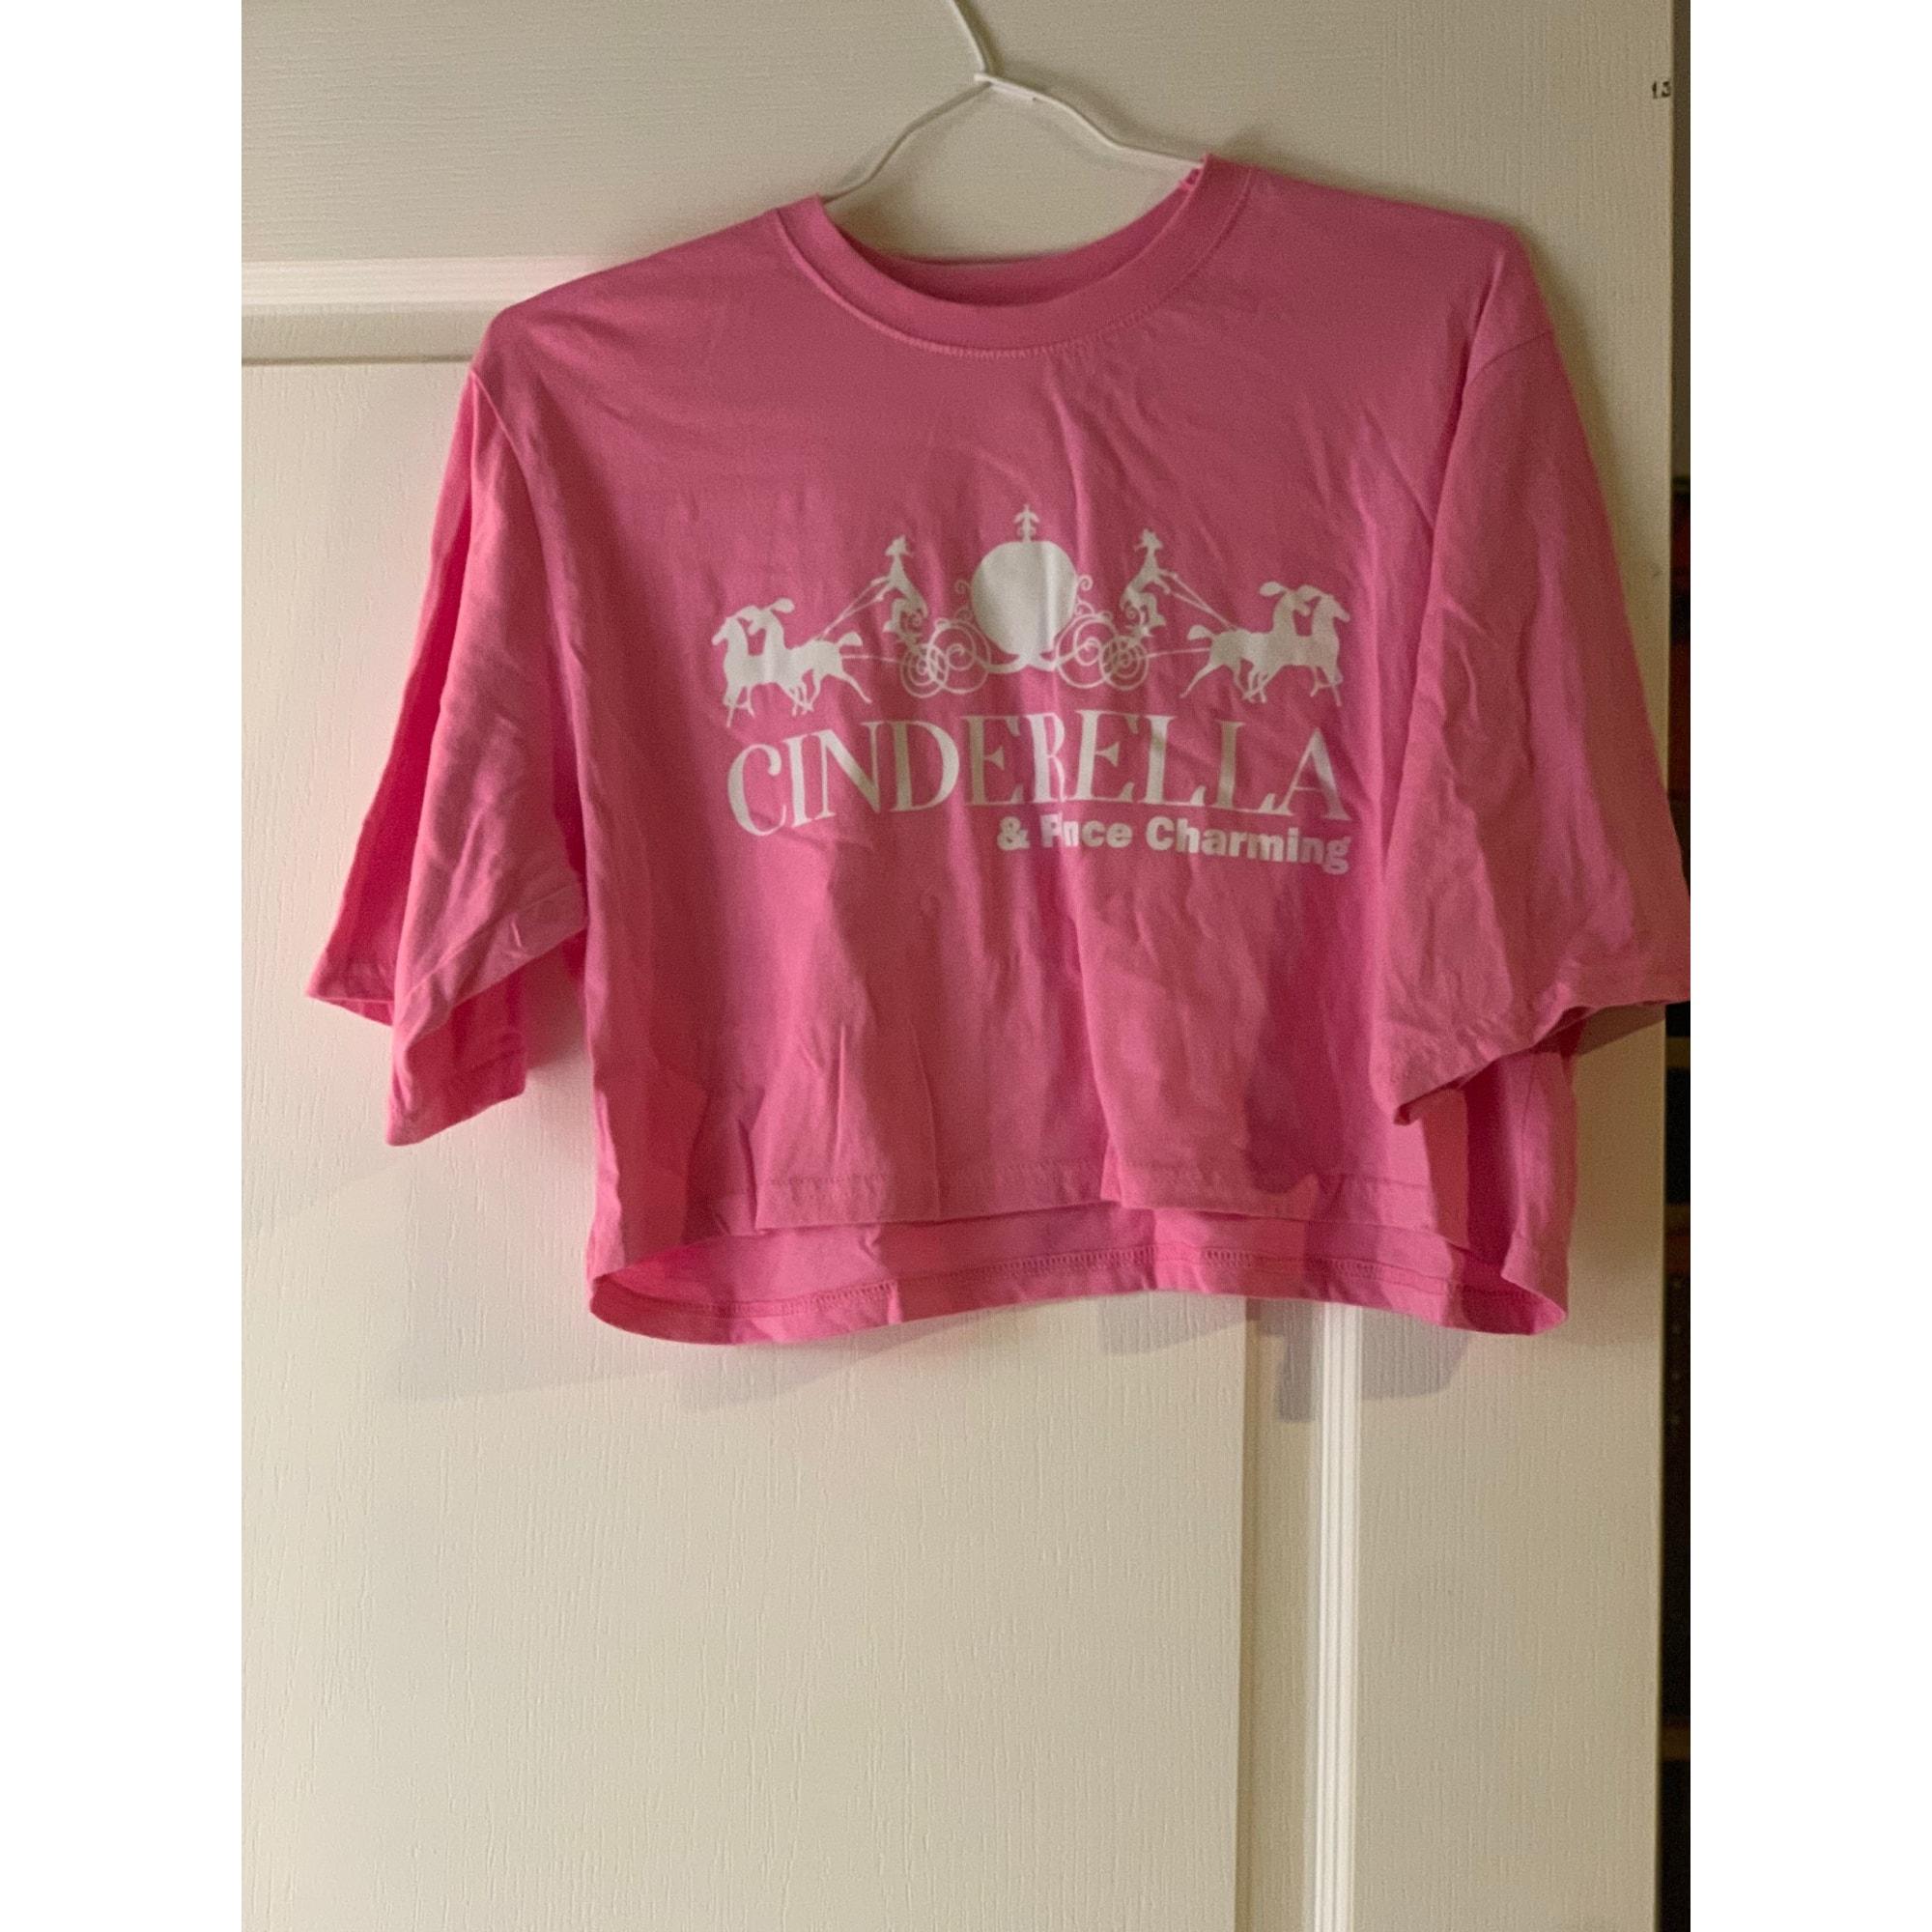 Top, tee-shirt JENNYFER Rose, fuschia, vieux rose